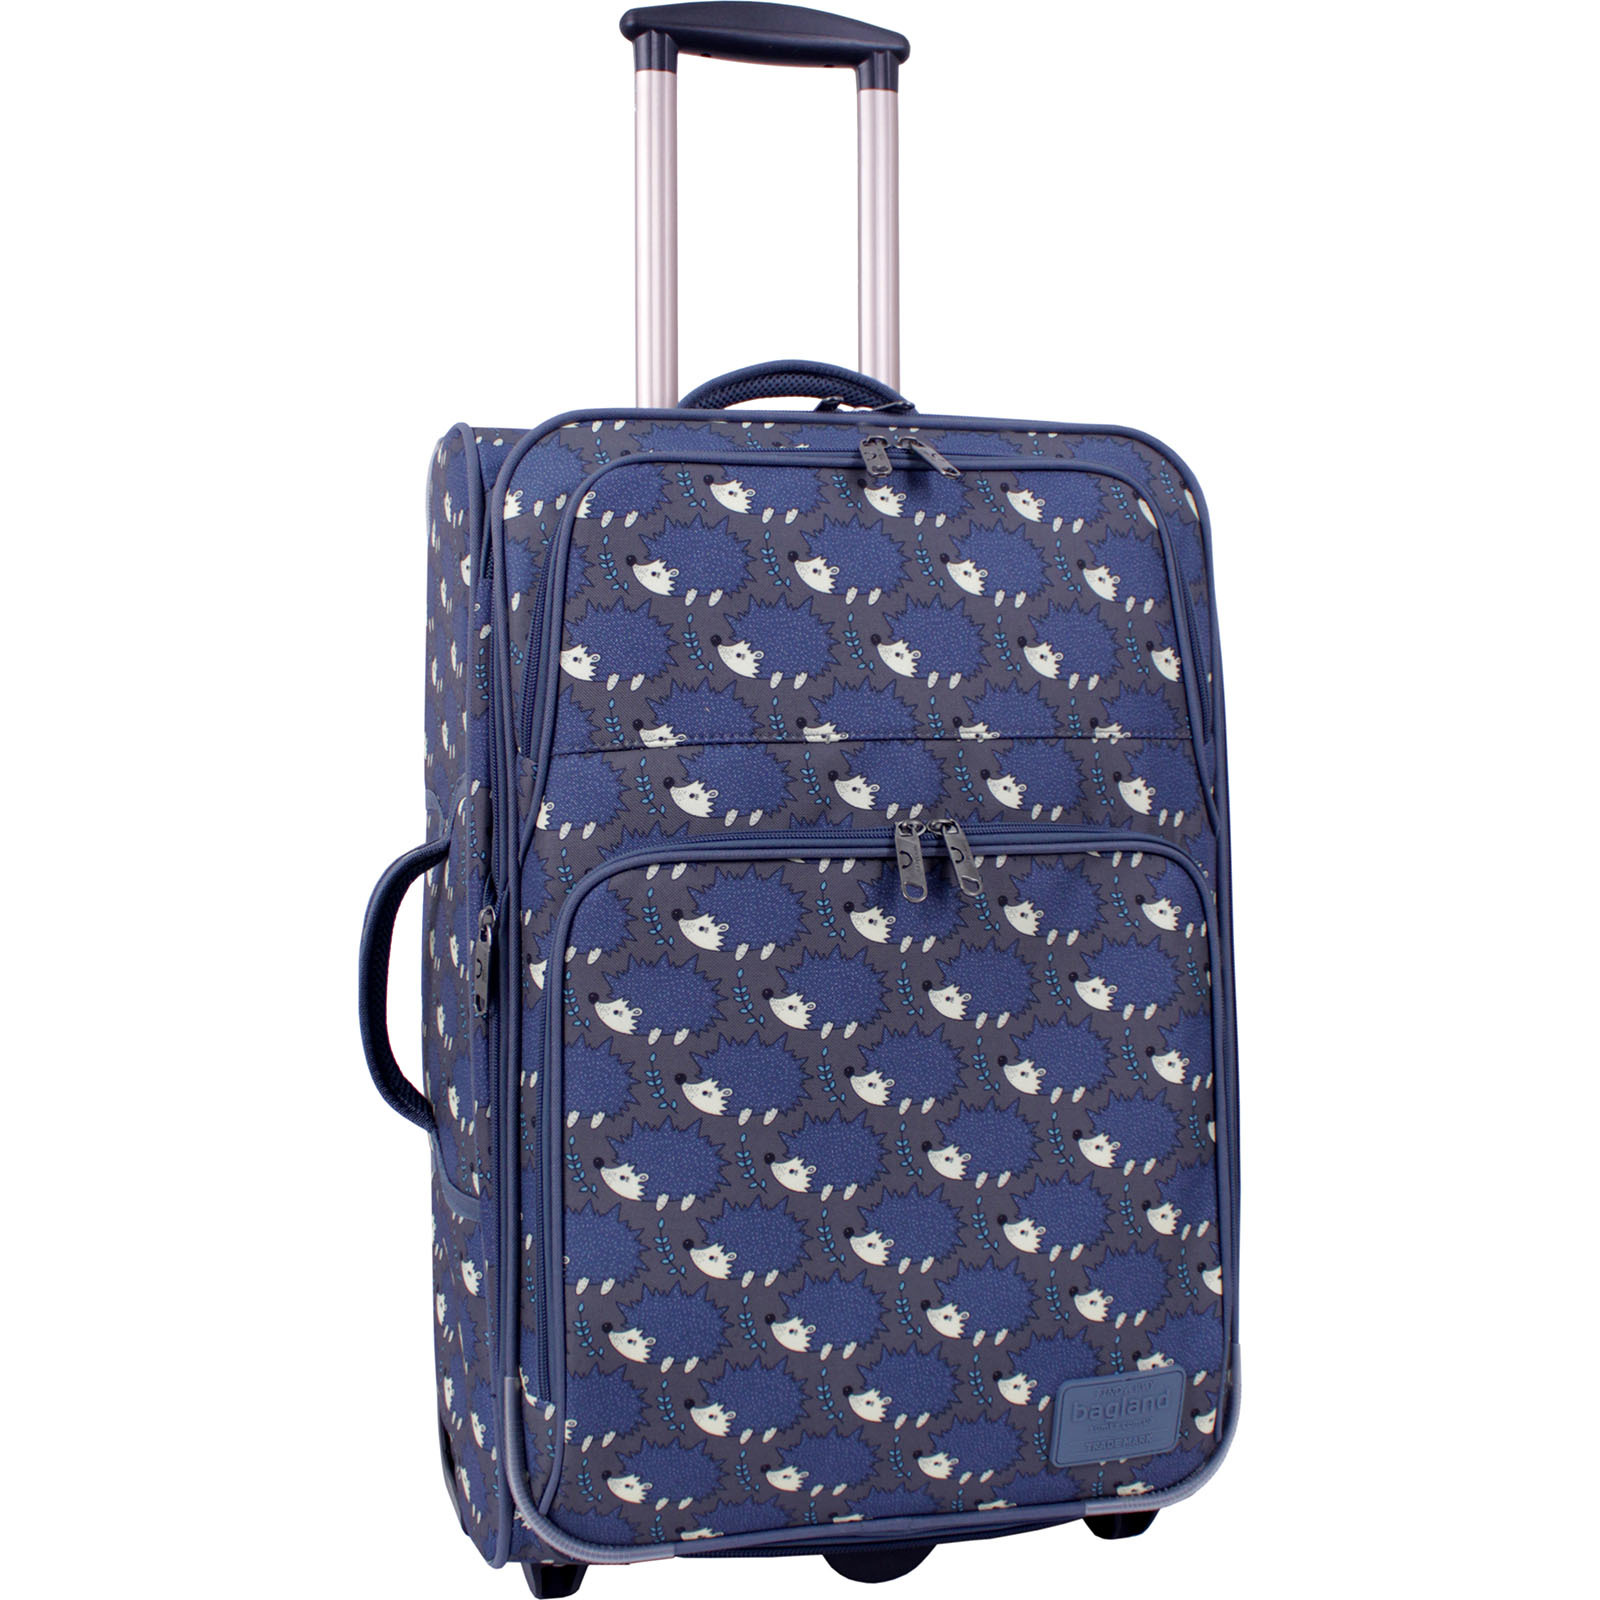 Дорожные чемоданы Чемодан Bagland Леон средний дизайн 51 л. сублімація 481 (0037666244) IMG_4756_суб.481_.JPG